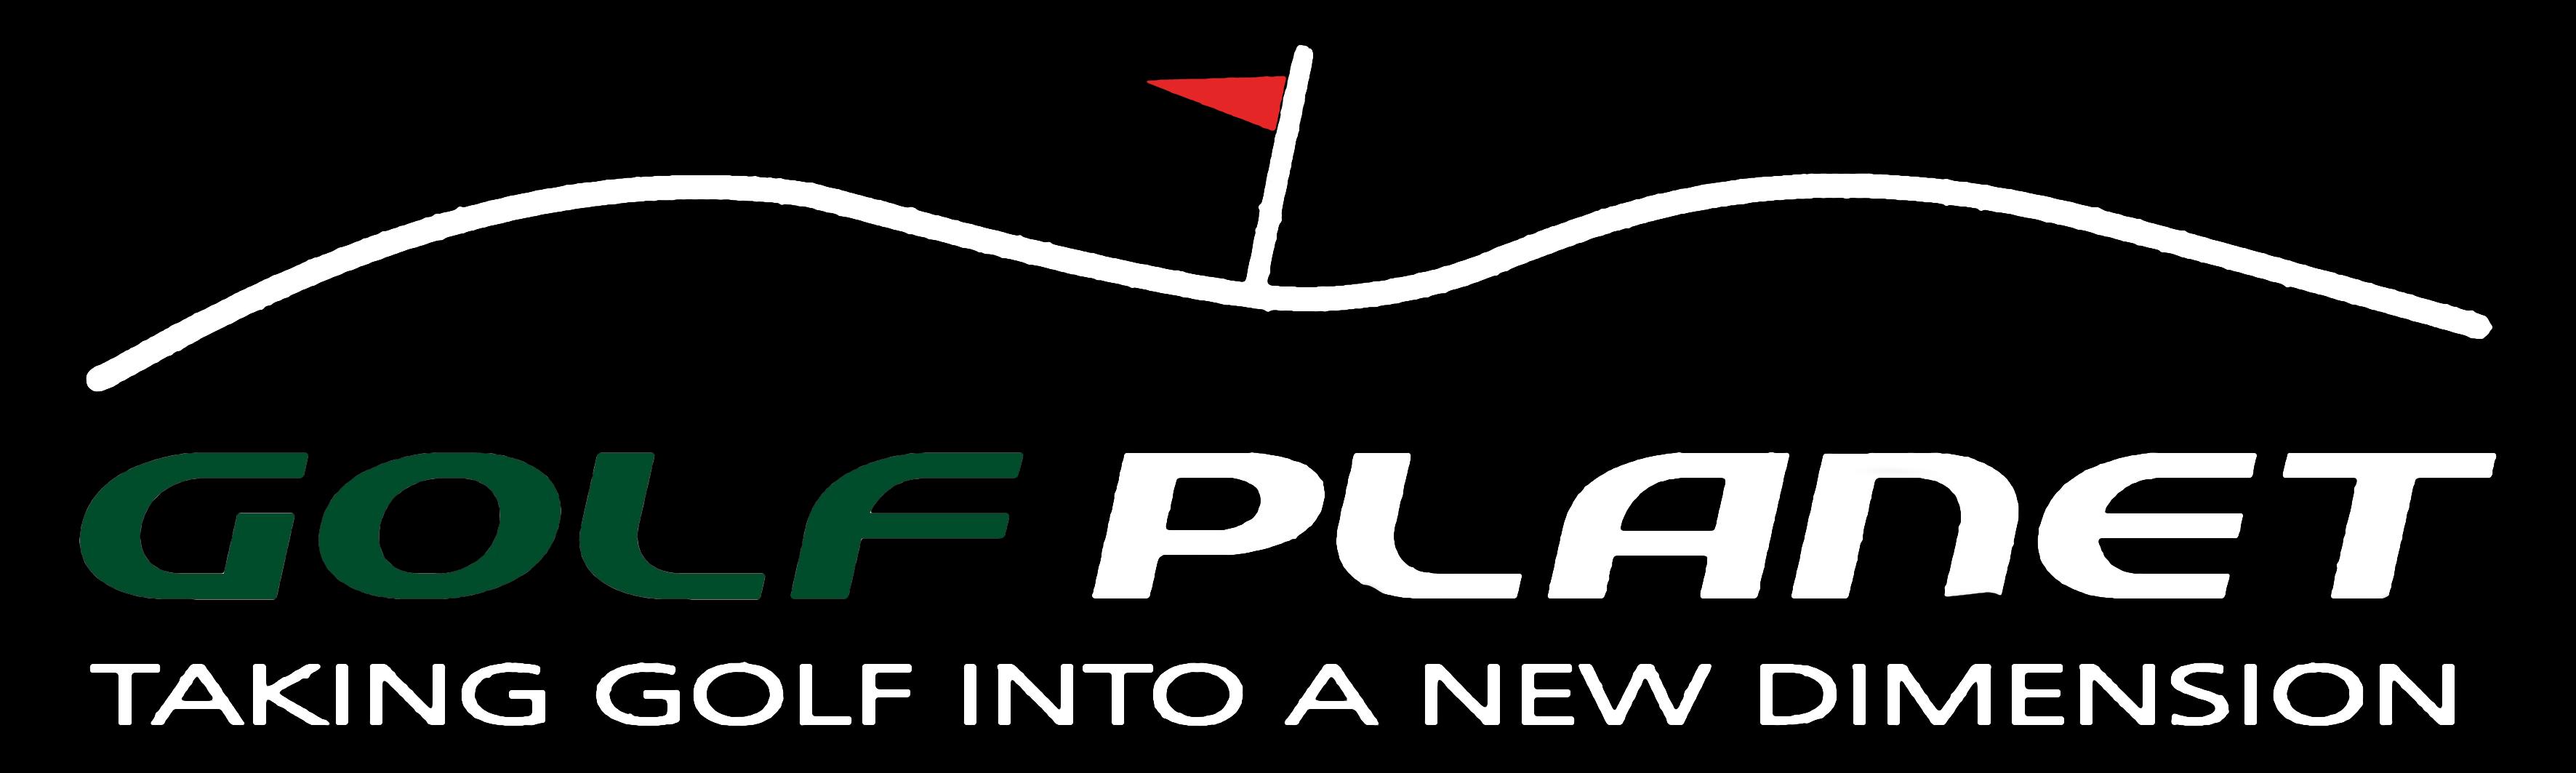 GolfPlanet